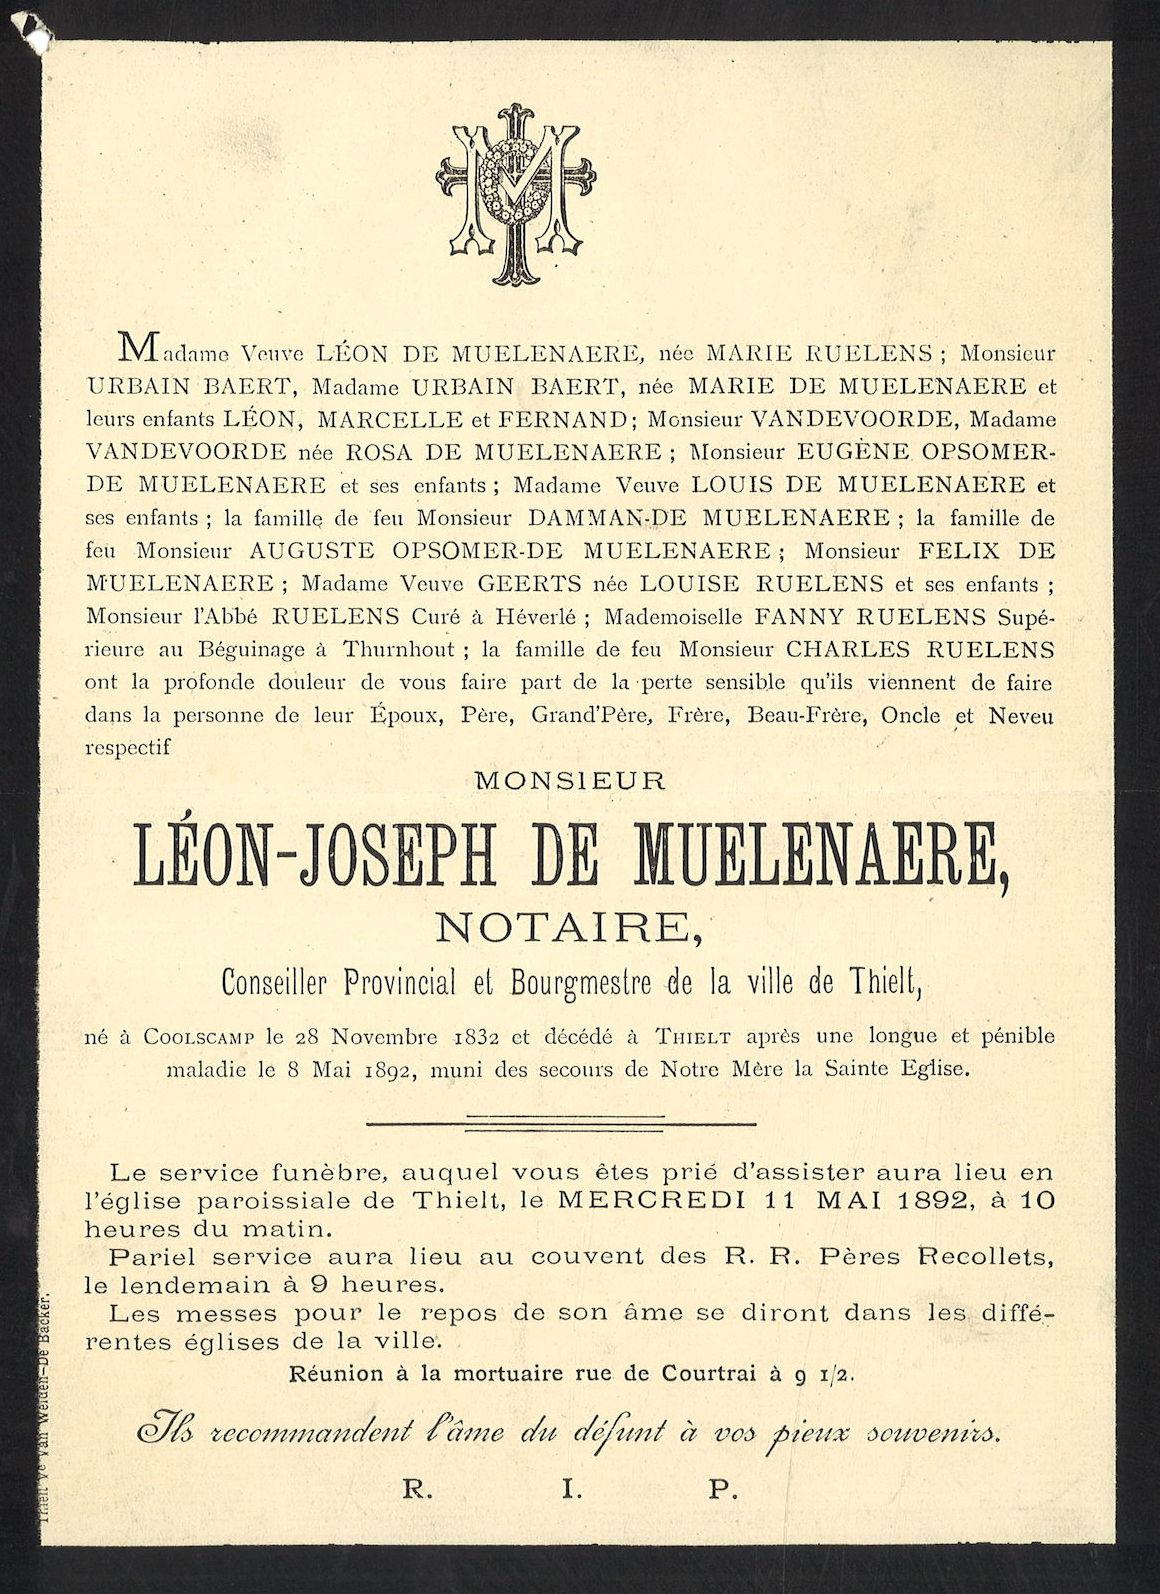 Léon-Joseph De Muelenaere